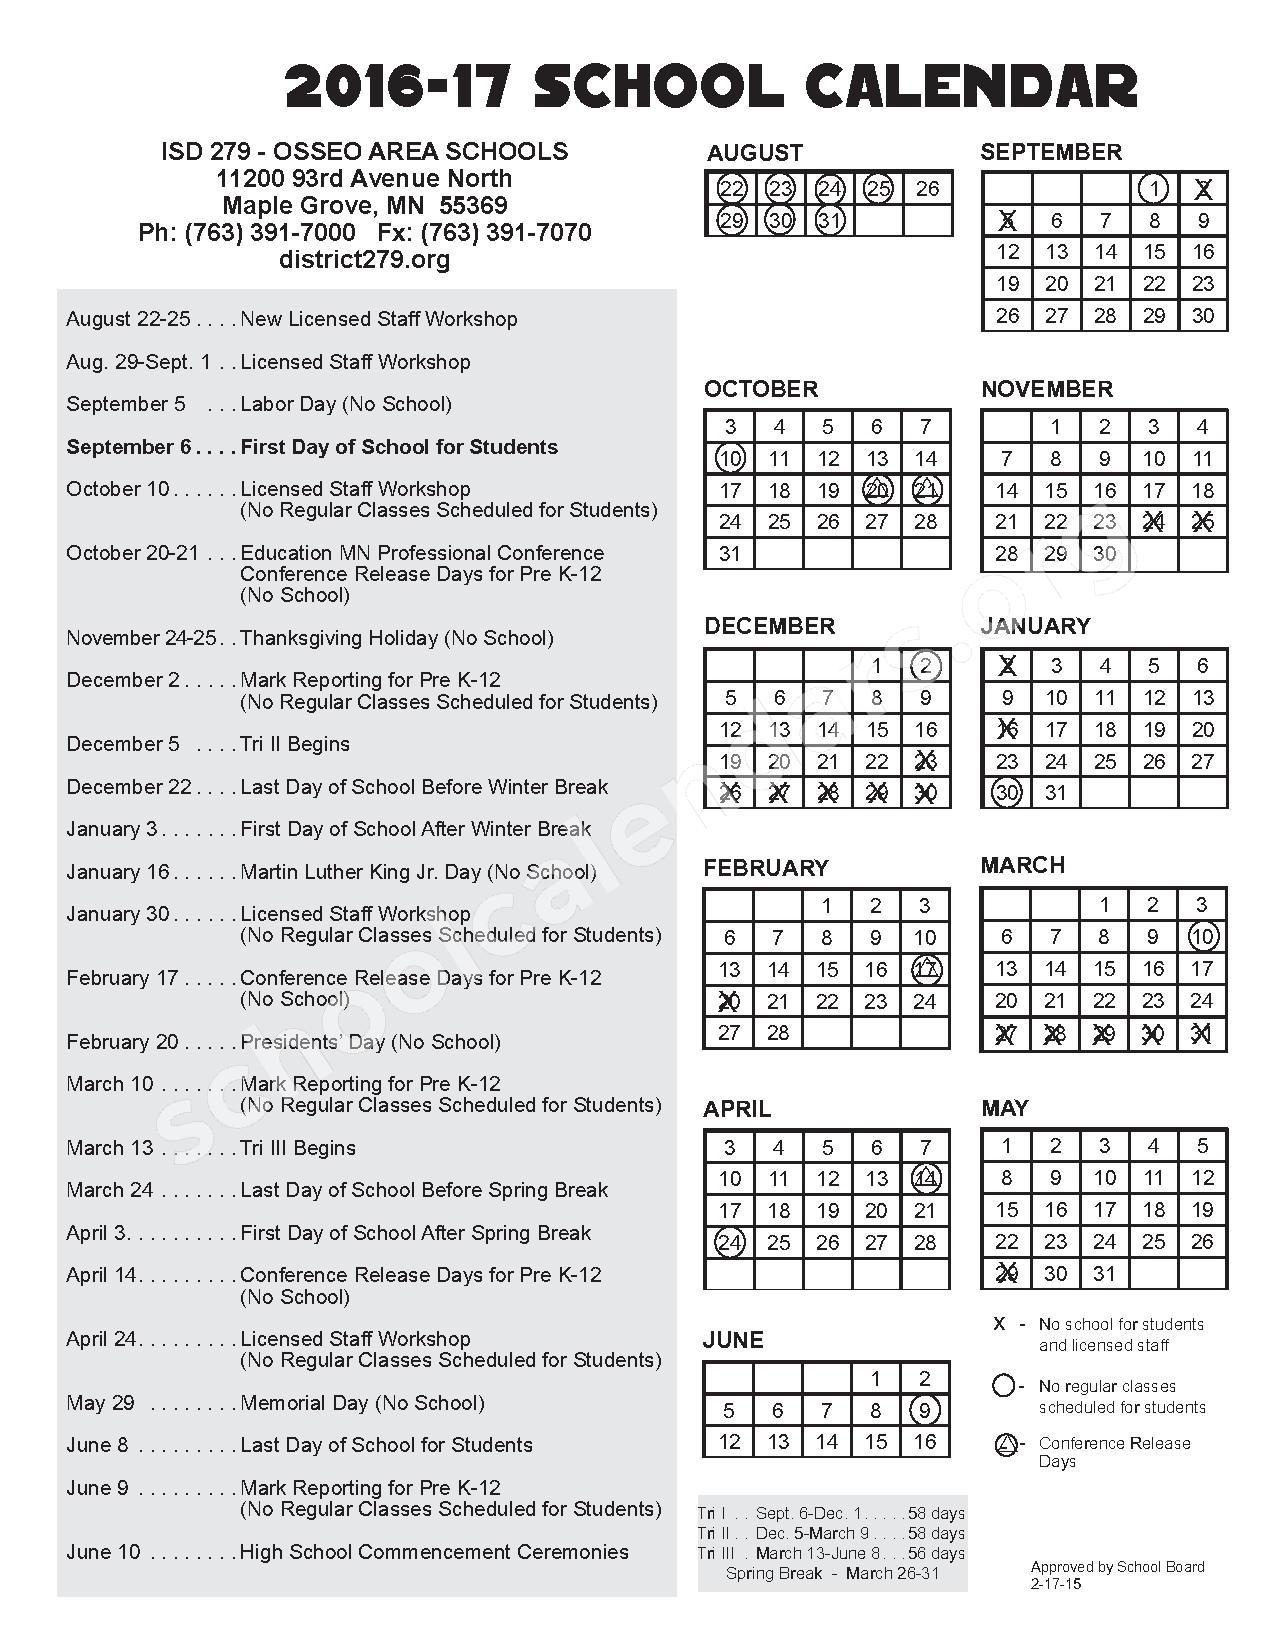 2016 - 2017 School Calendar – Edinbrook Elementary School – page 1